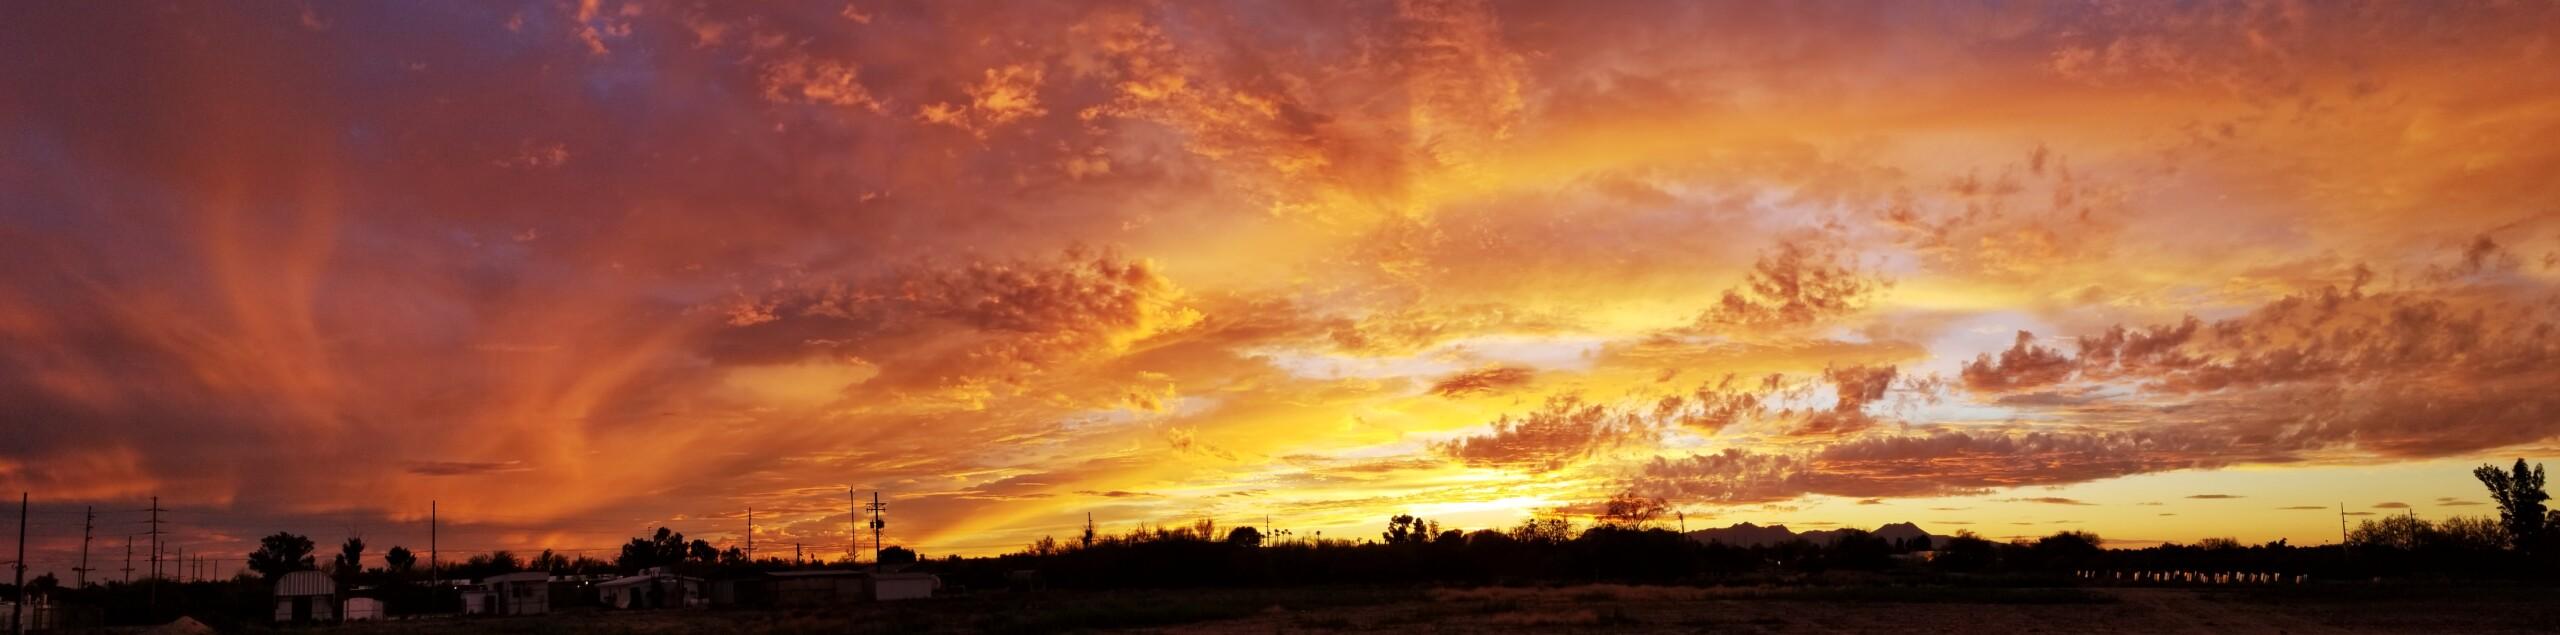 UA-Tucson Sunset Wyatt C Morgan.jpg